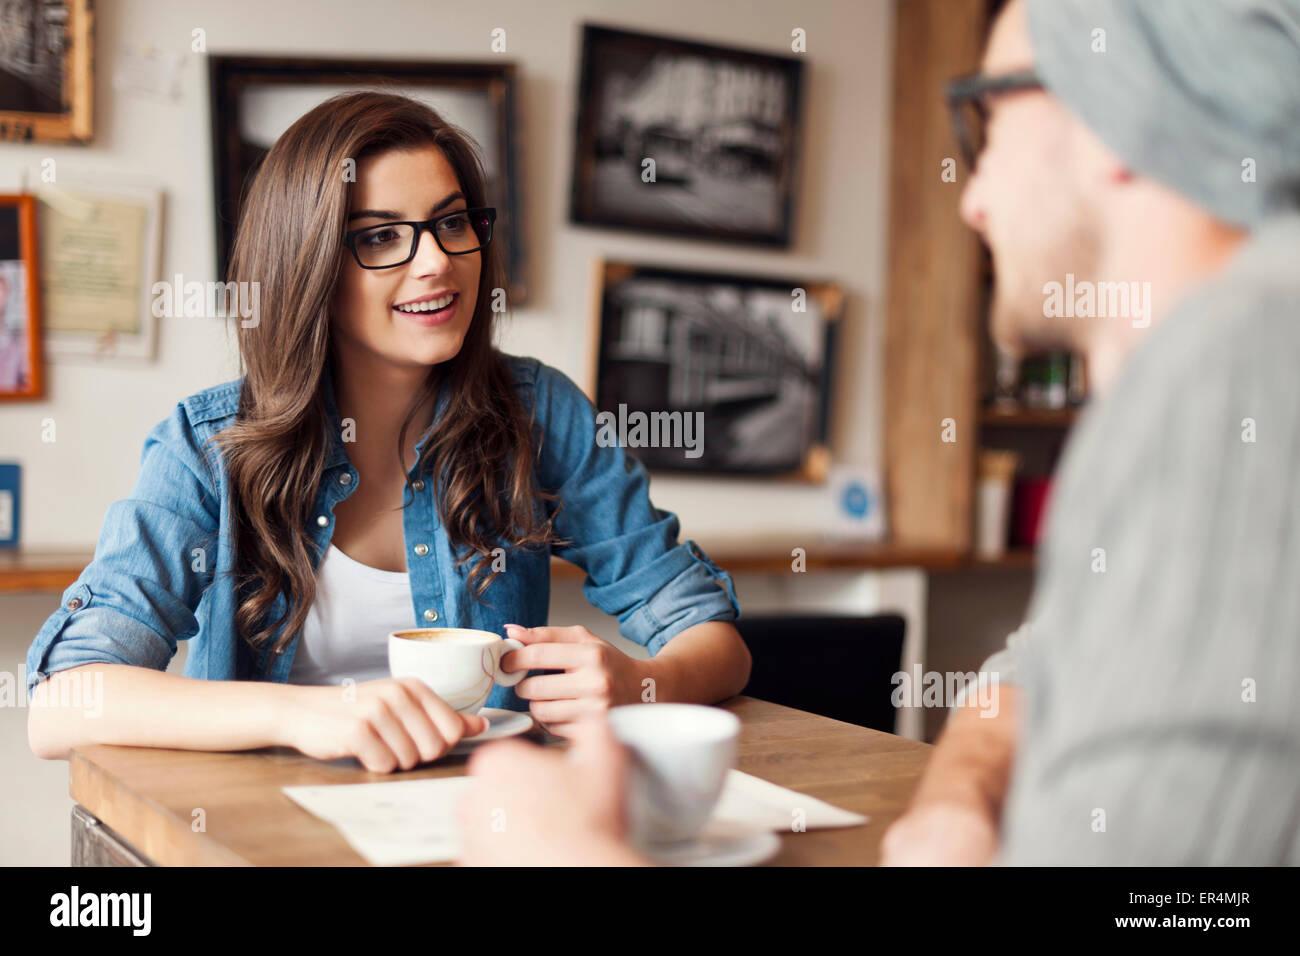 Stilvolle paar sprechen im Café. Krakau, Polen Stockbild